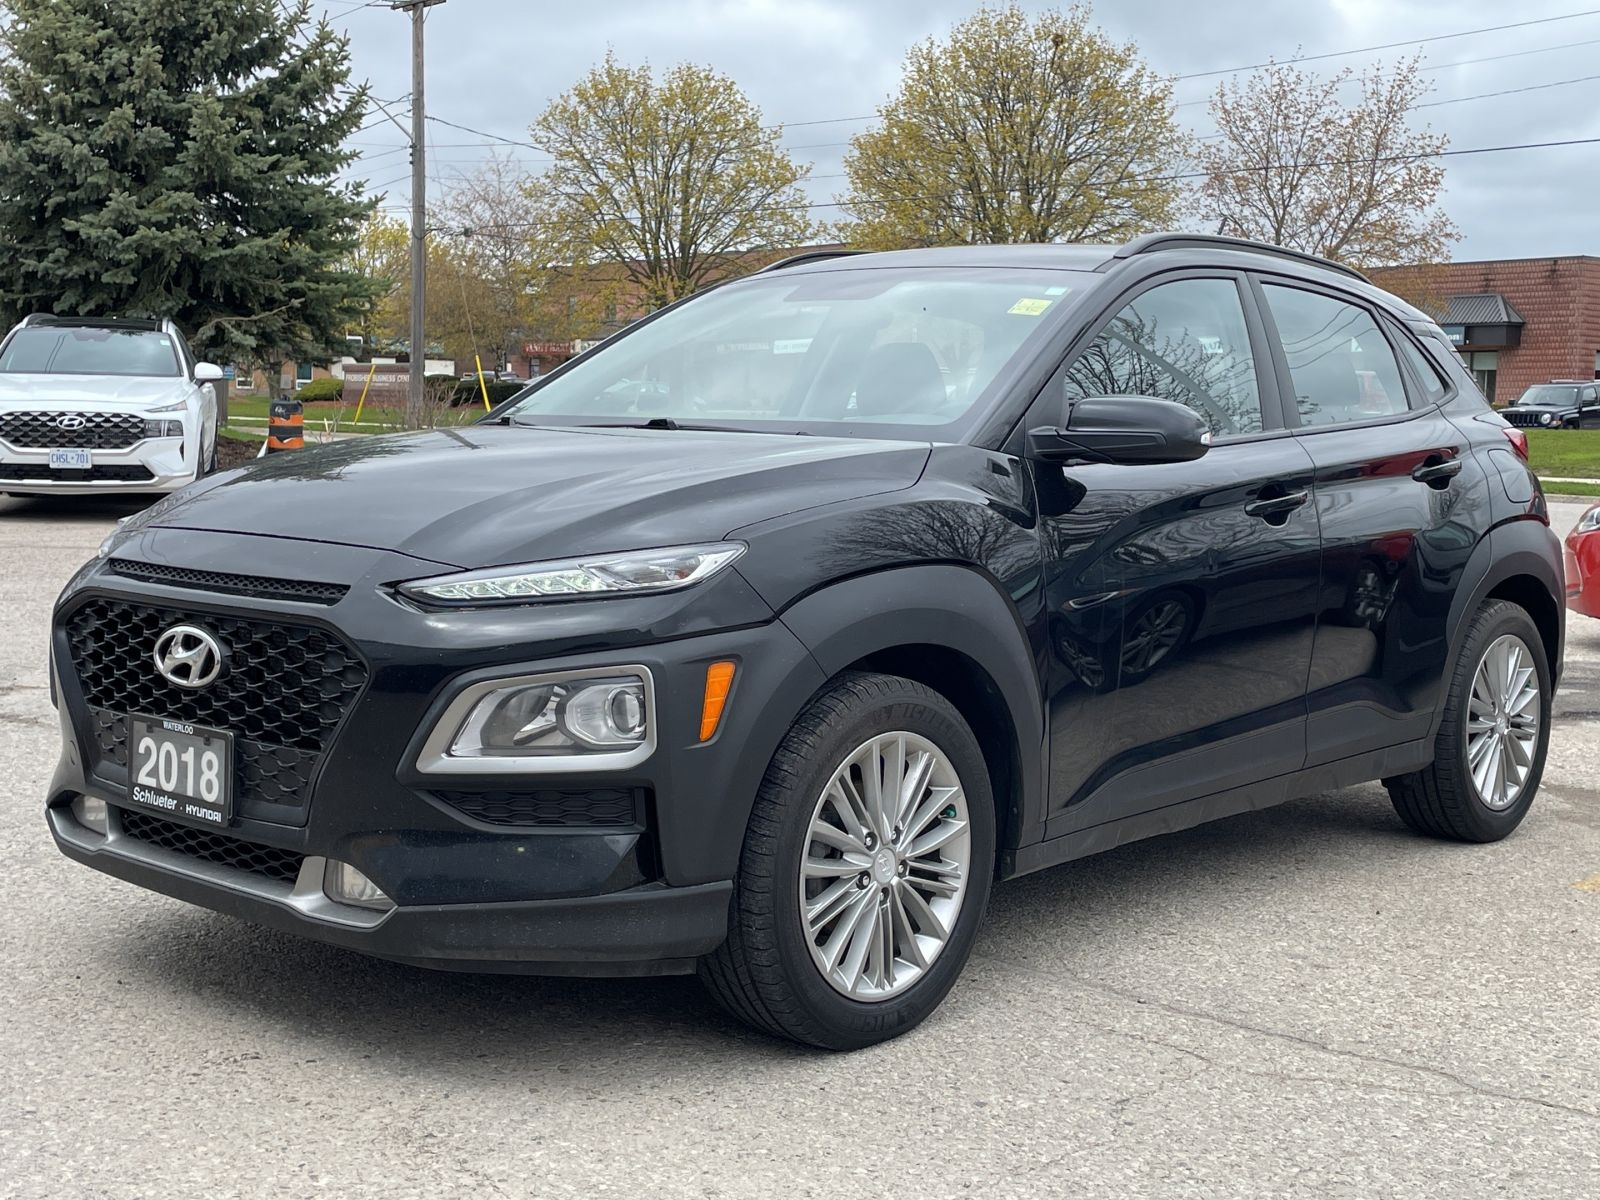 2018 Hyundai Kona Image